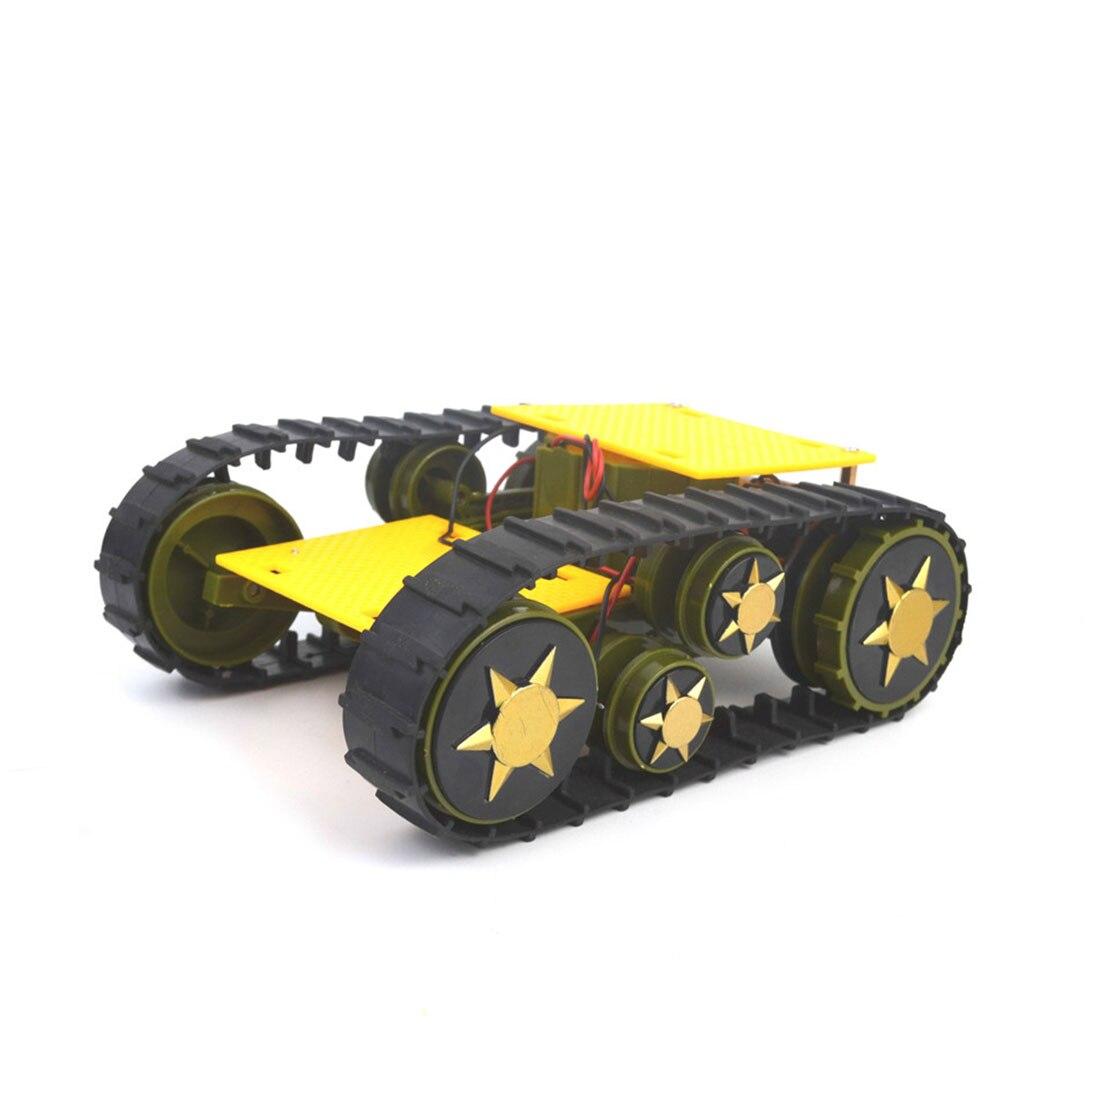 DIY Deformation Smart Tank Robot Crawler Caterpillar Vehicle Platform For Arduino SN1900 Educational Toy Gift For Kids Adults